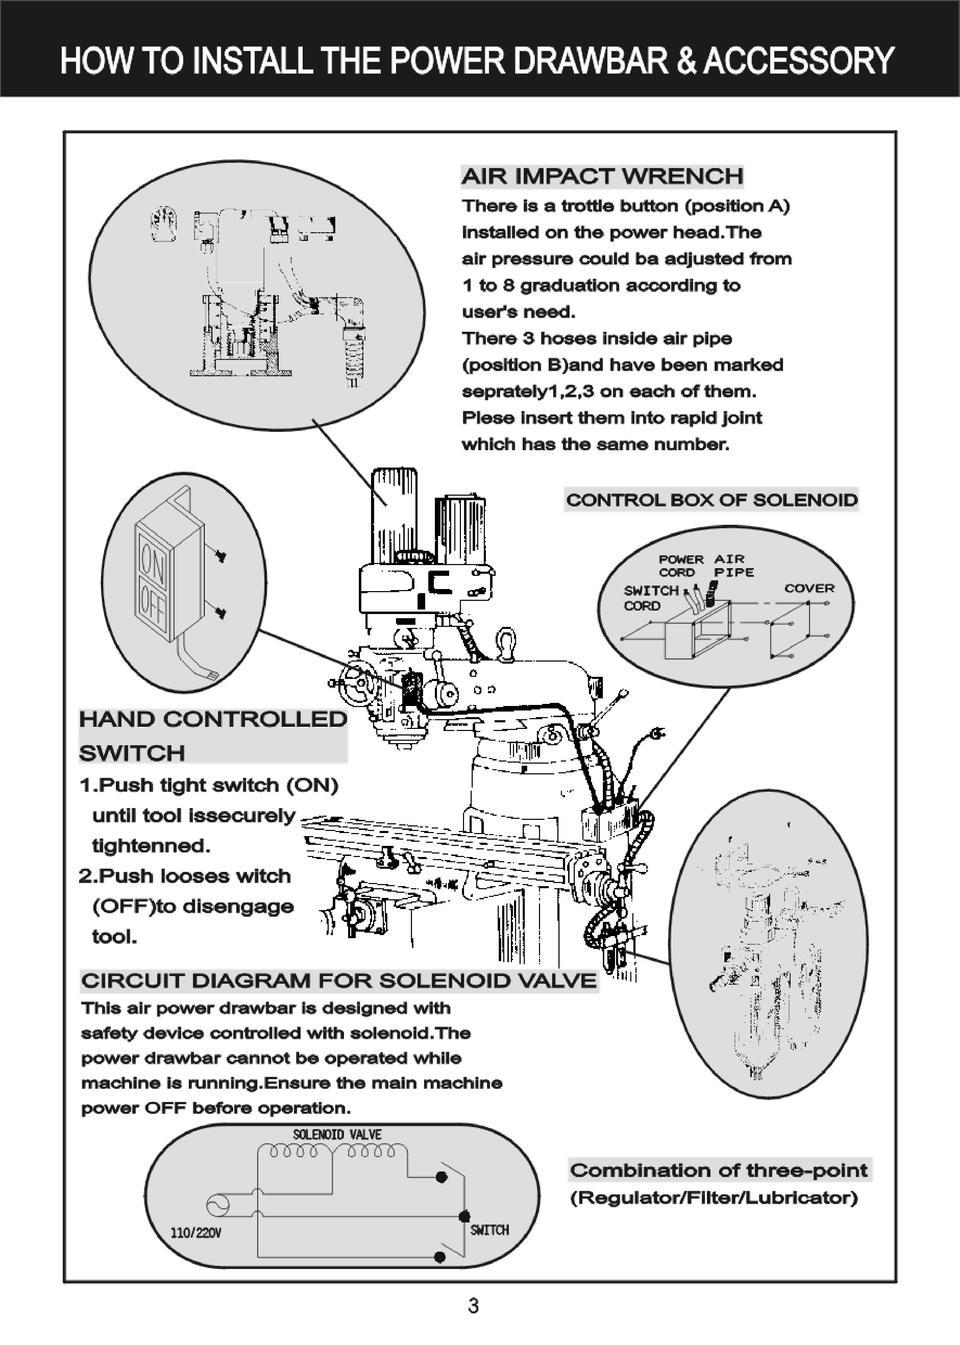 Manual Align Pd 150 Pneumatic D Air Solenoid Schematic